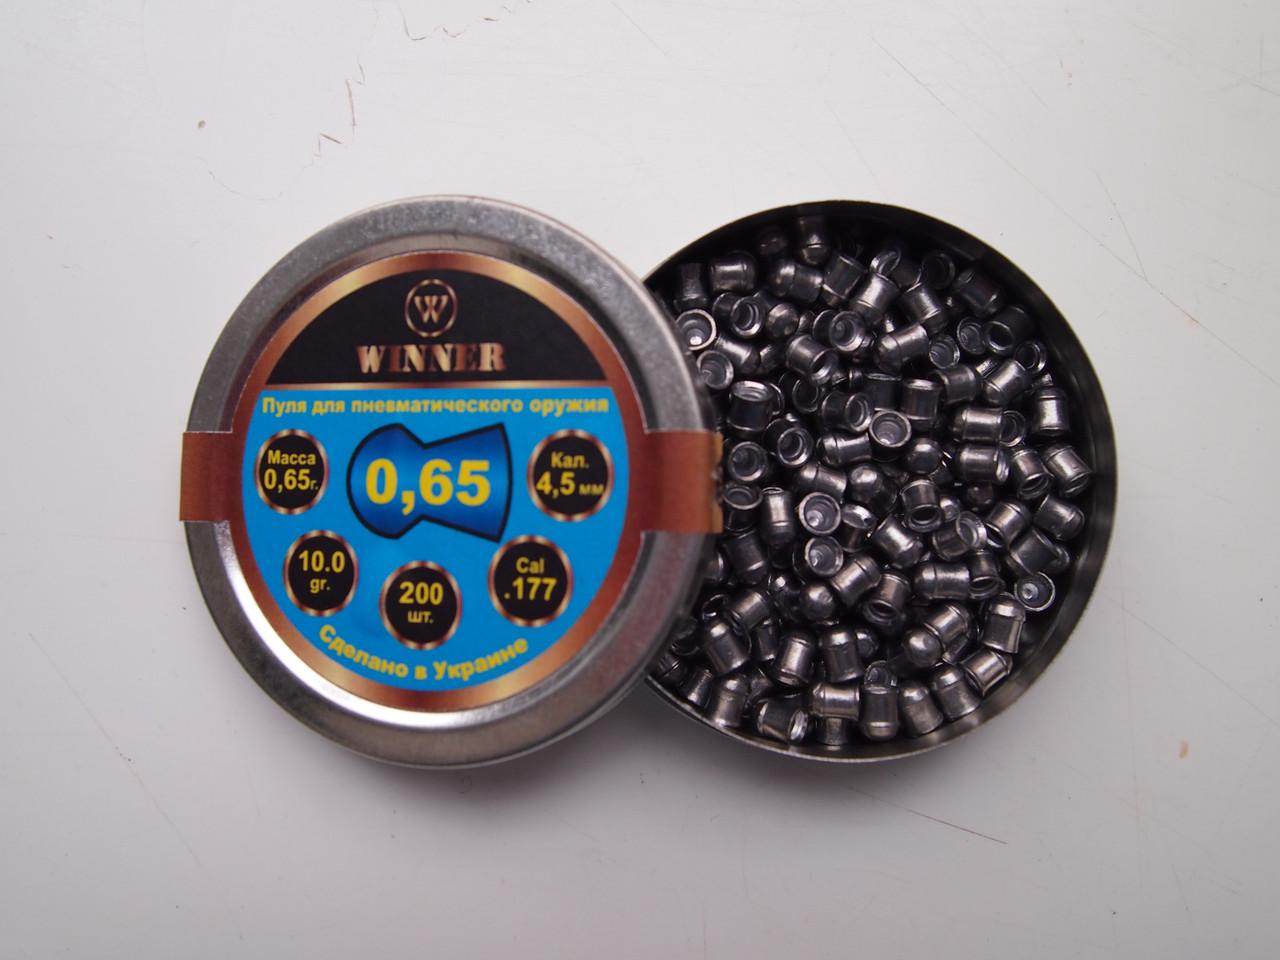 Пули 4,5 мм Winner 0,65 г кругл. (200 шт.)